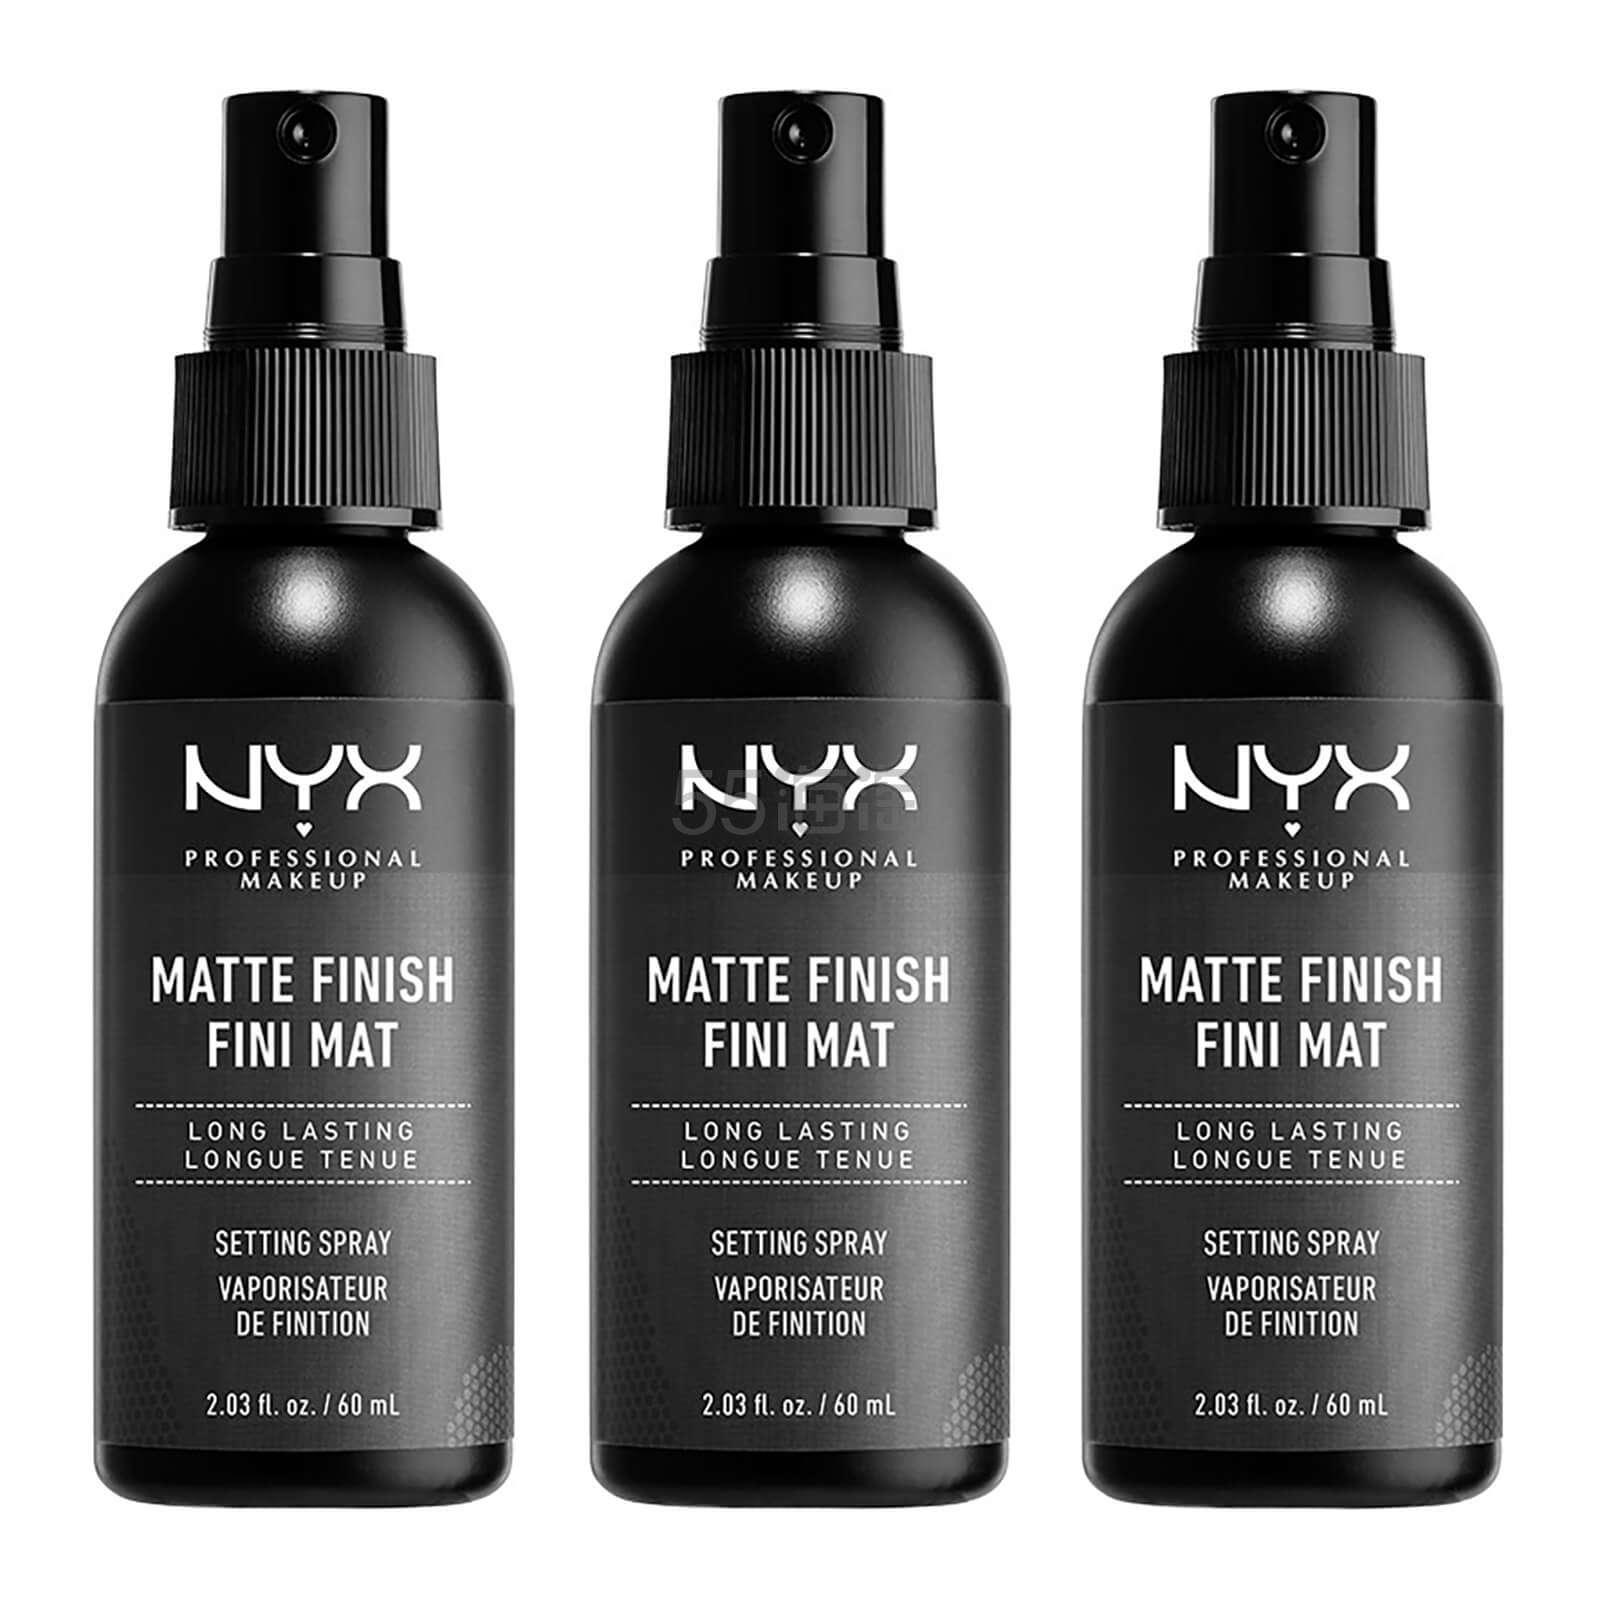 NYX 哑光定妆喷雾 60ml×3瓶 £14.45(约123元) - 海淘优惠海淘折扣|55海淘网